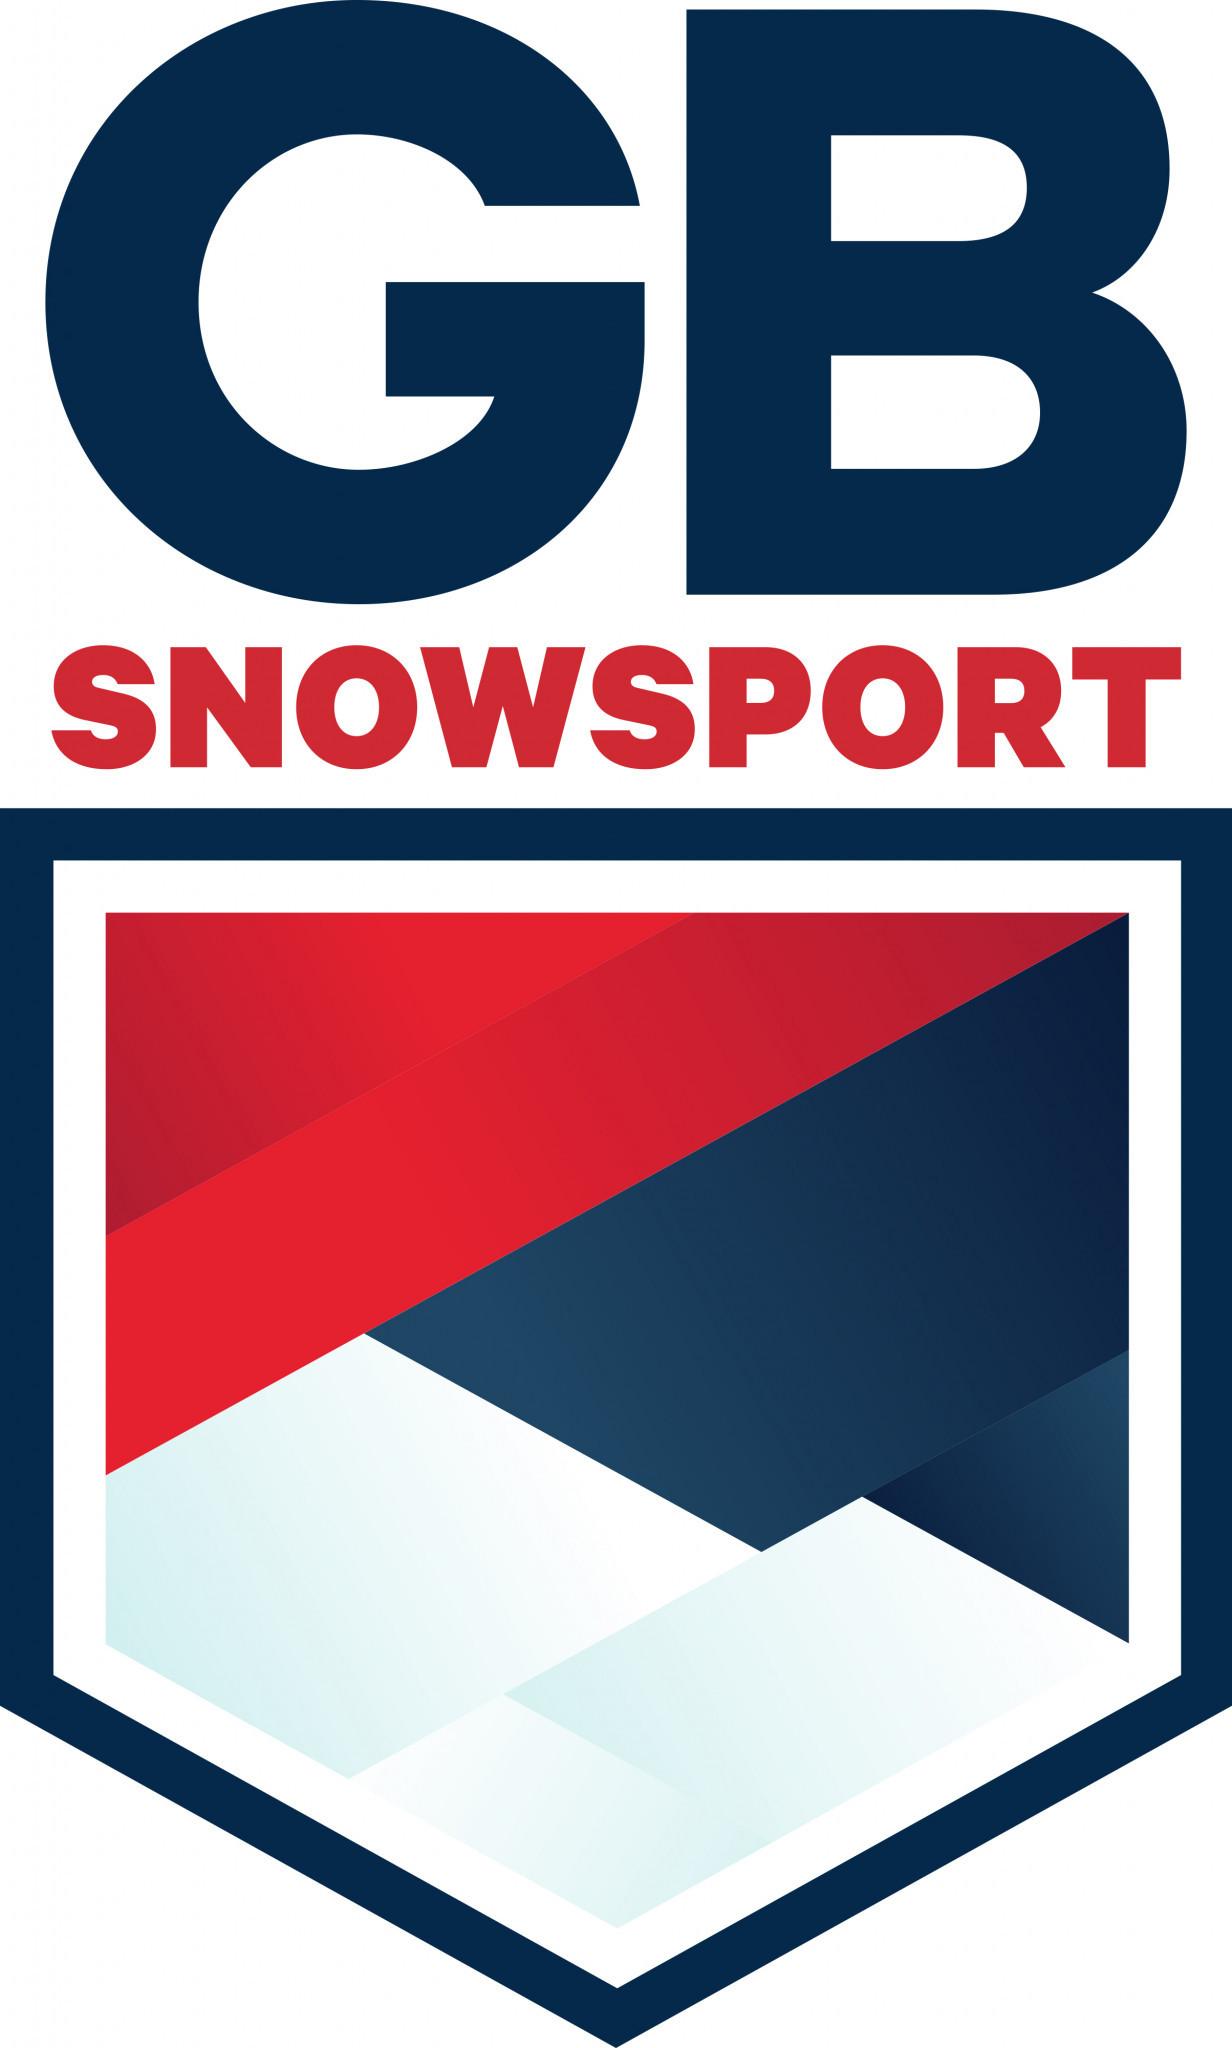 British Ski and Snowboard rebrands to GB Snowsport to become more inclusive